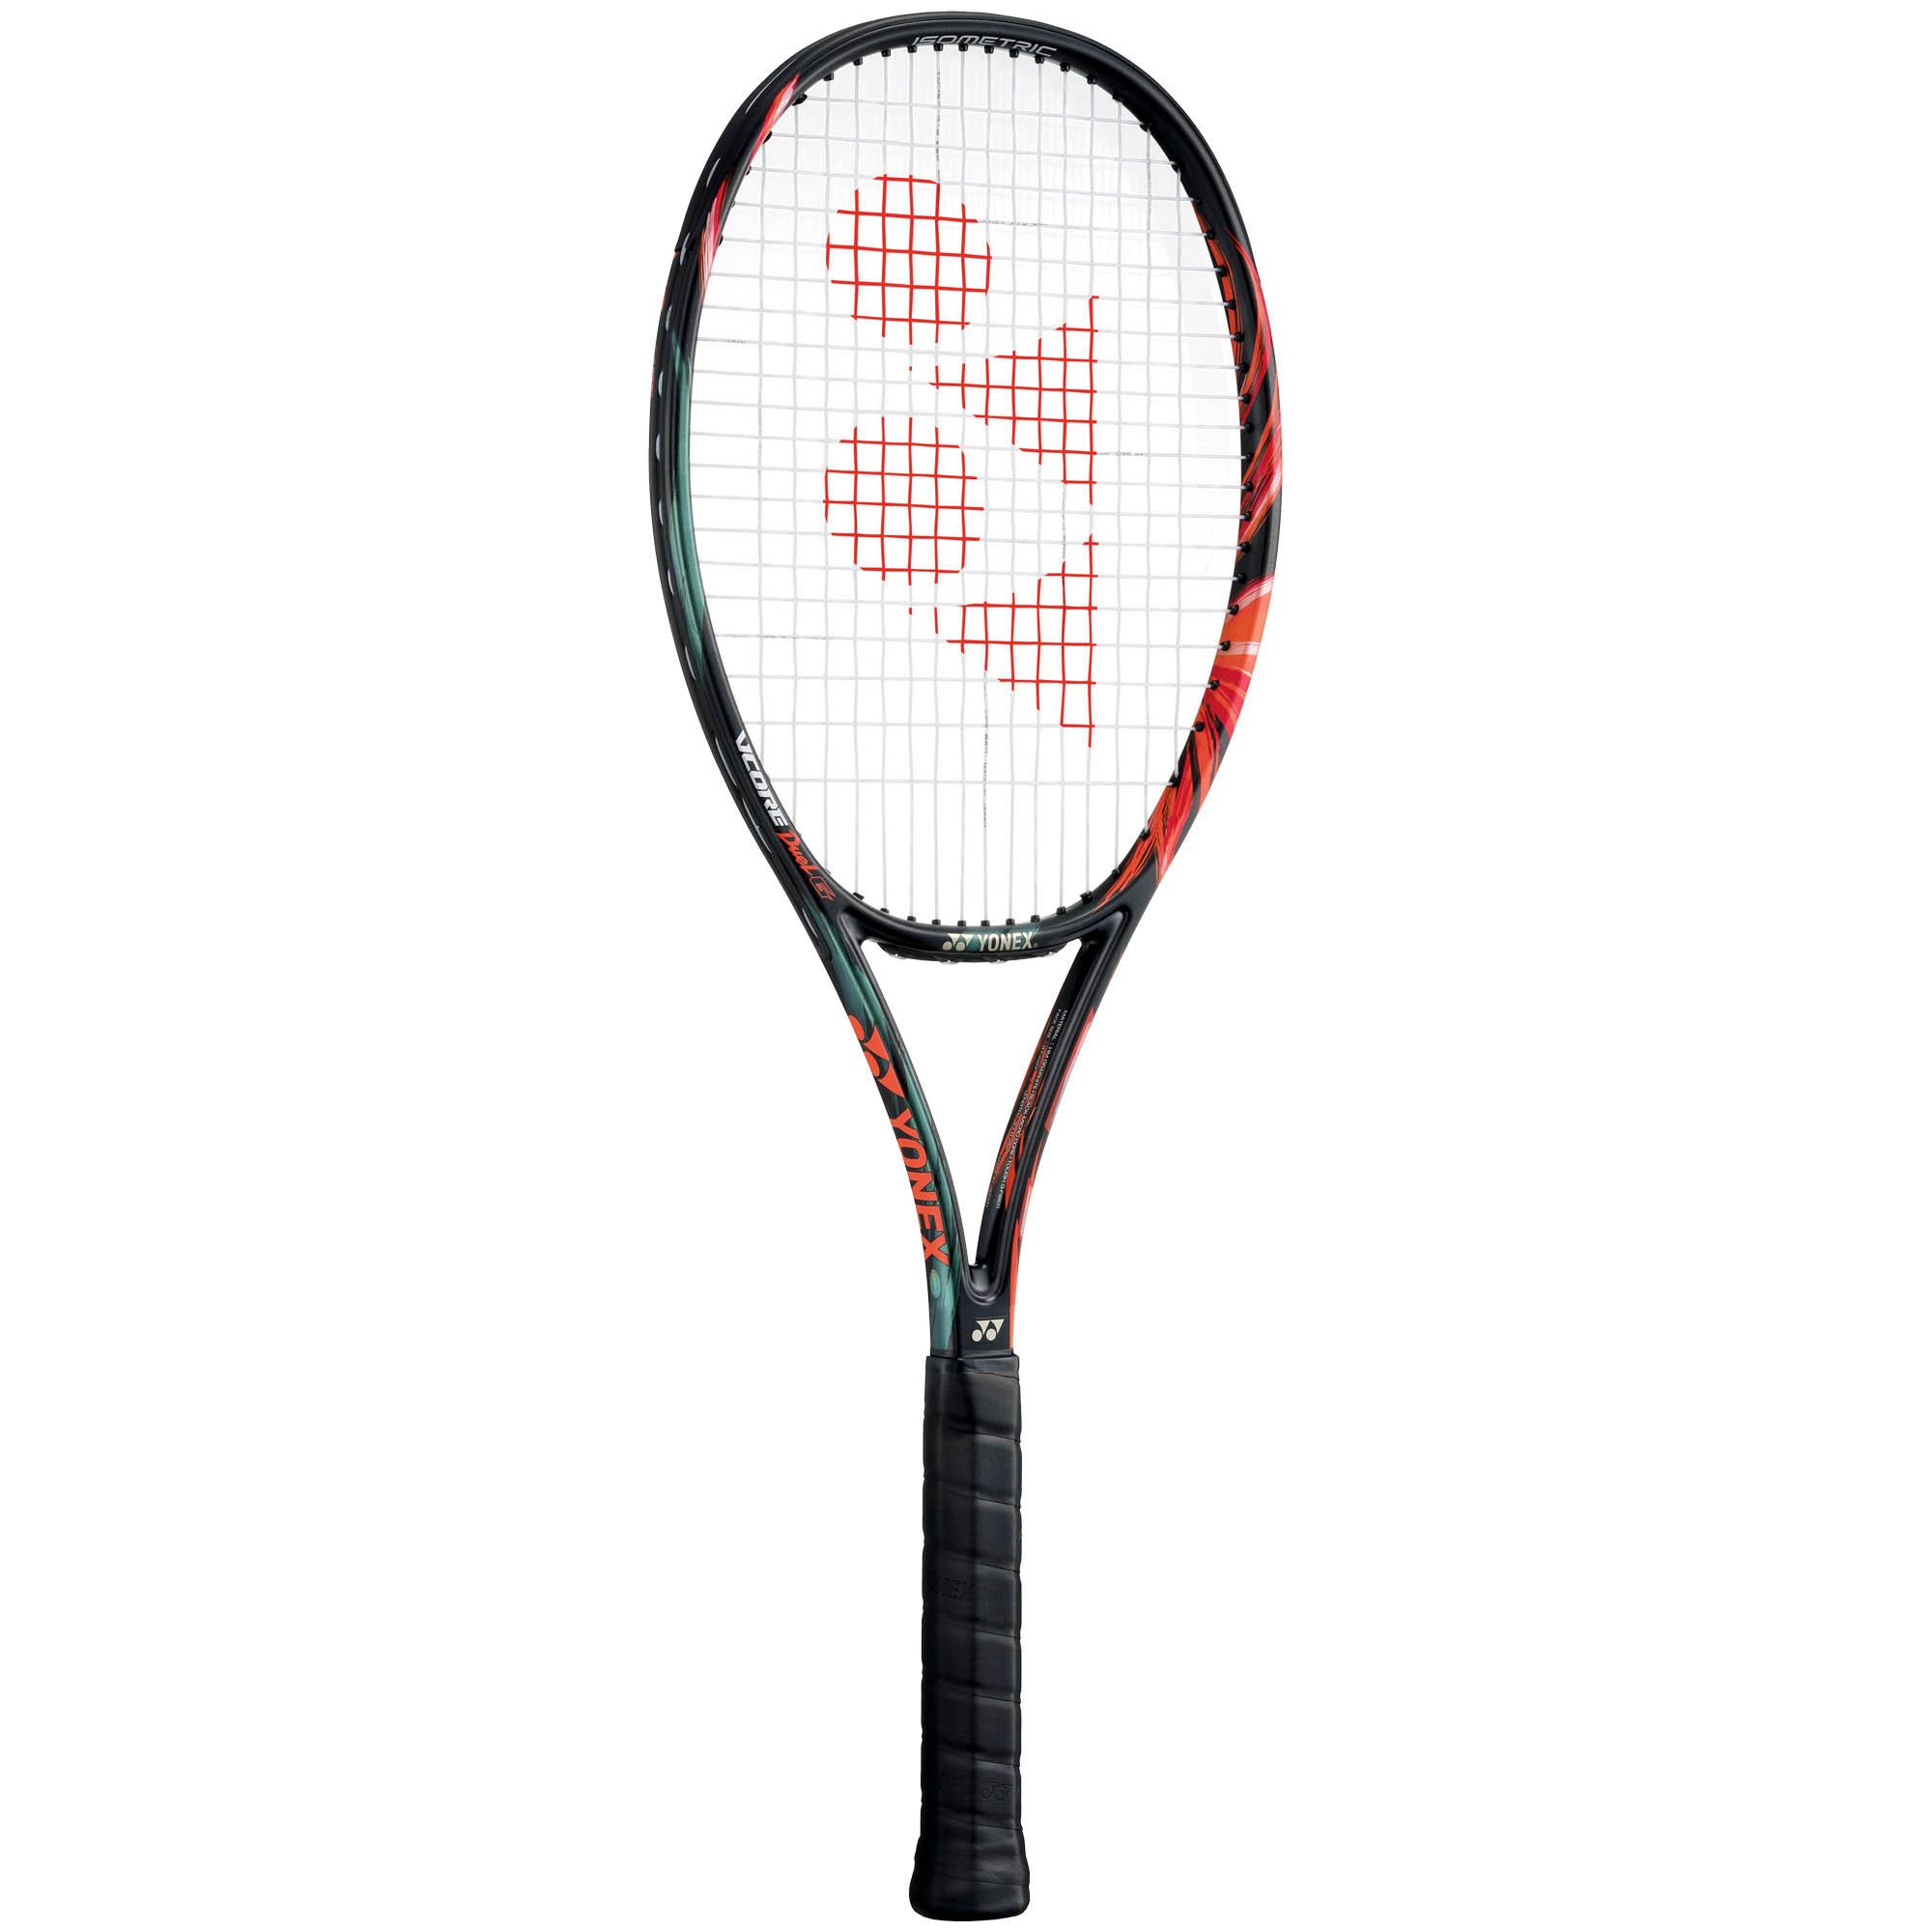 Yonex VCORE Duel G 97 Tennis Racket  Grip 2